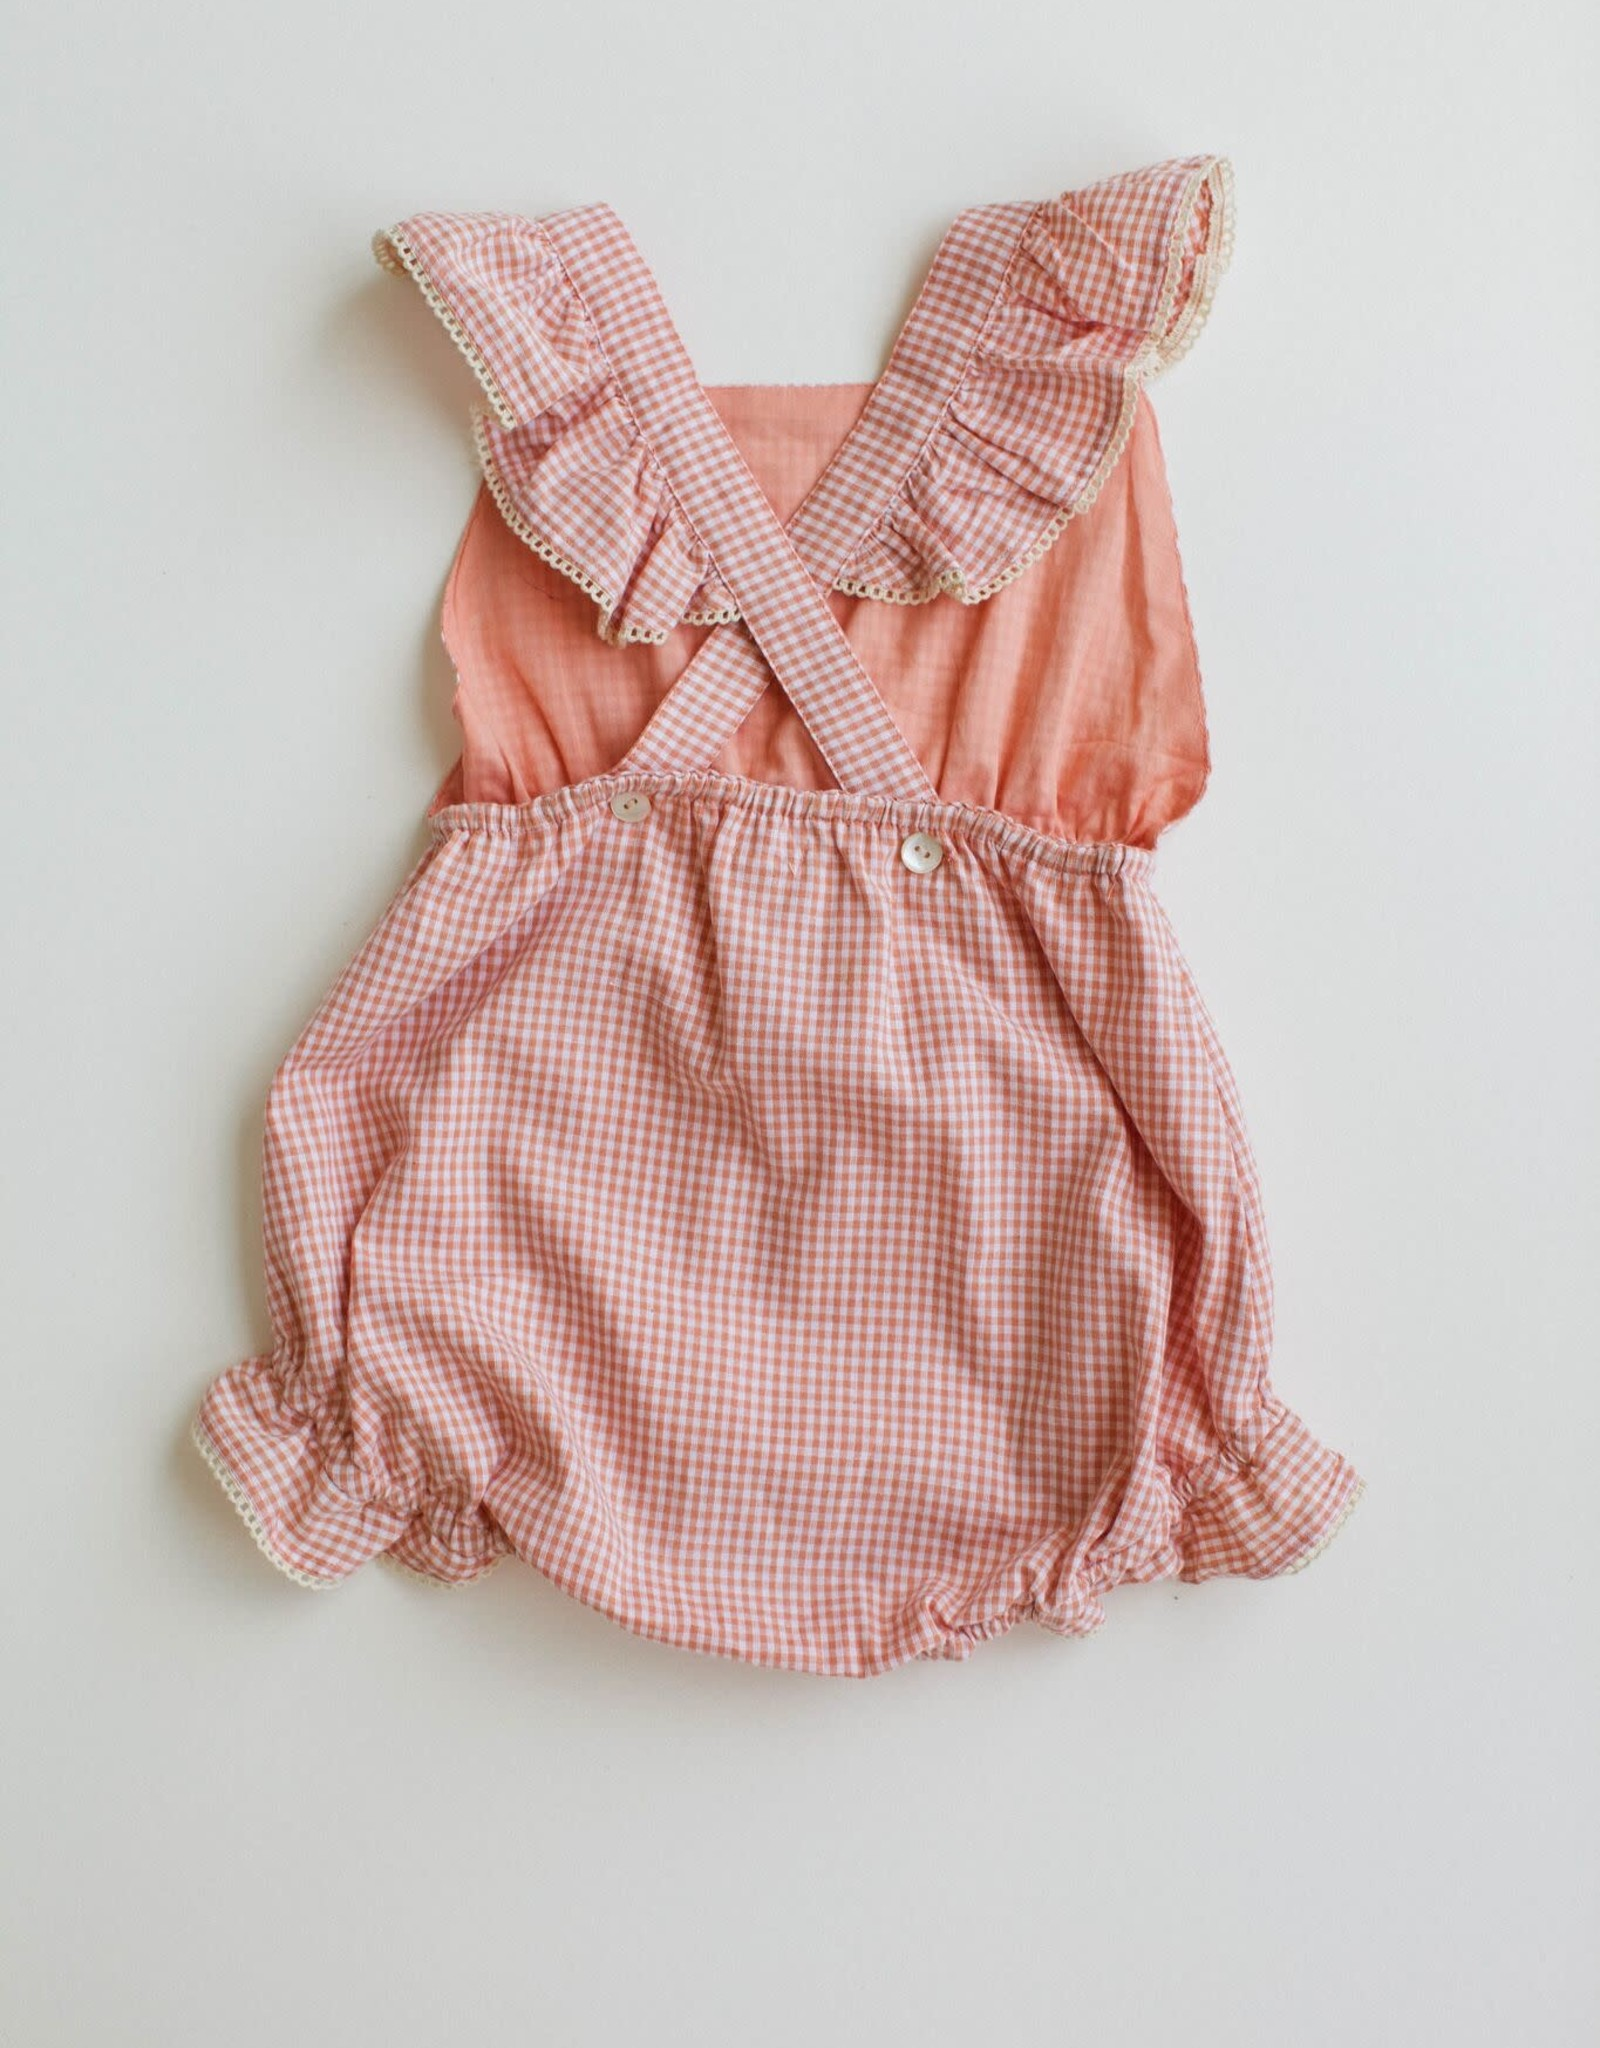 Lali Kids poppy romper- peach chex